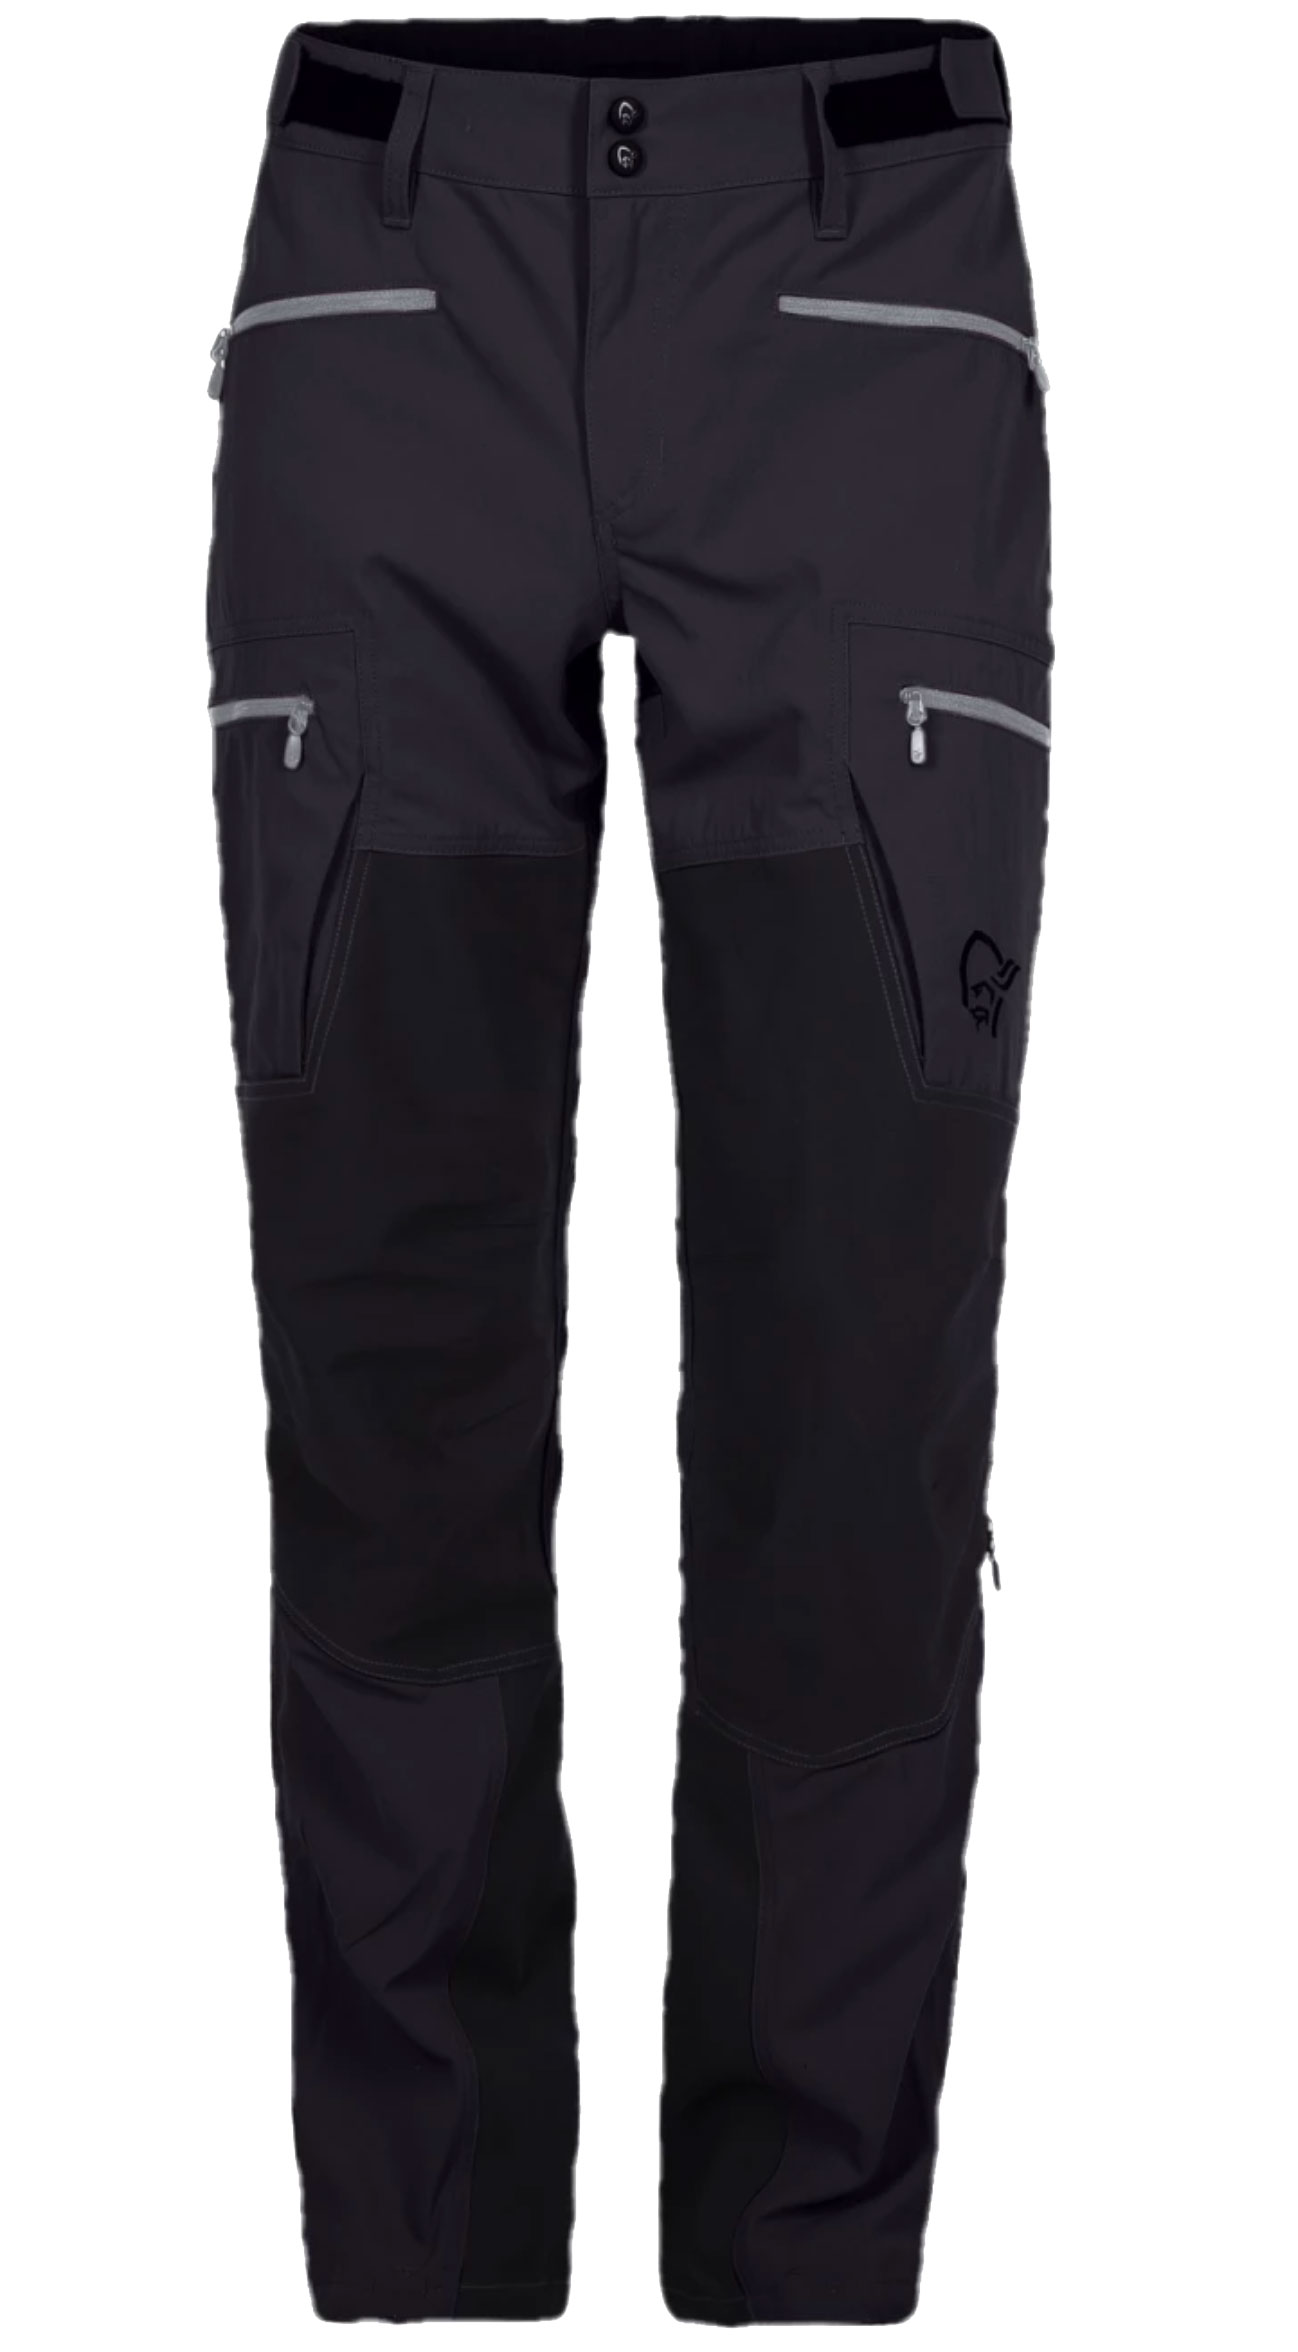 Braasport Norrøna Svalbard Heavy Duty Pants W turbukse, dame